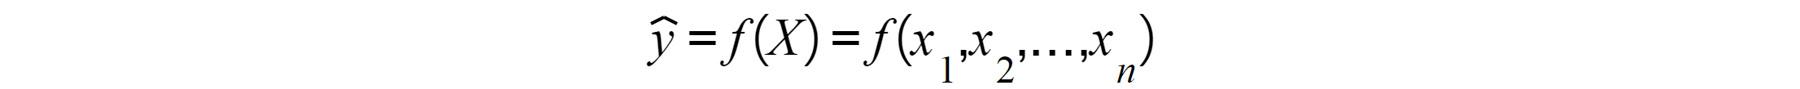 Figure 1.37: Function f()